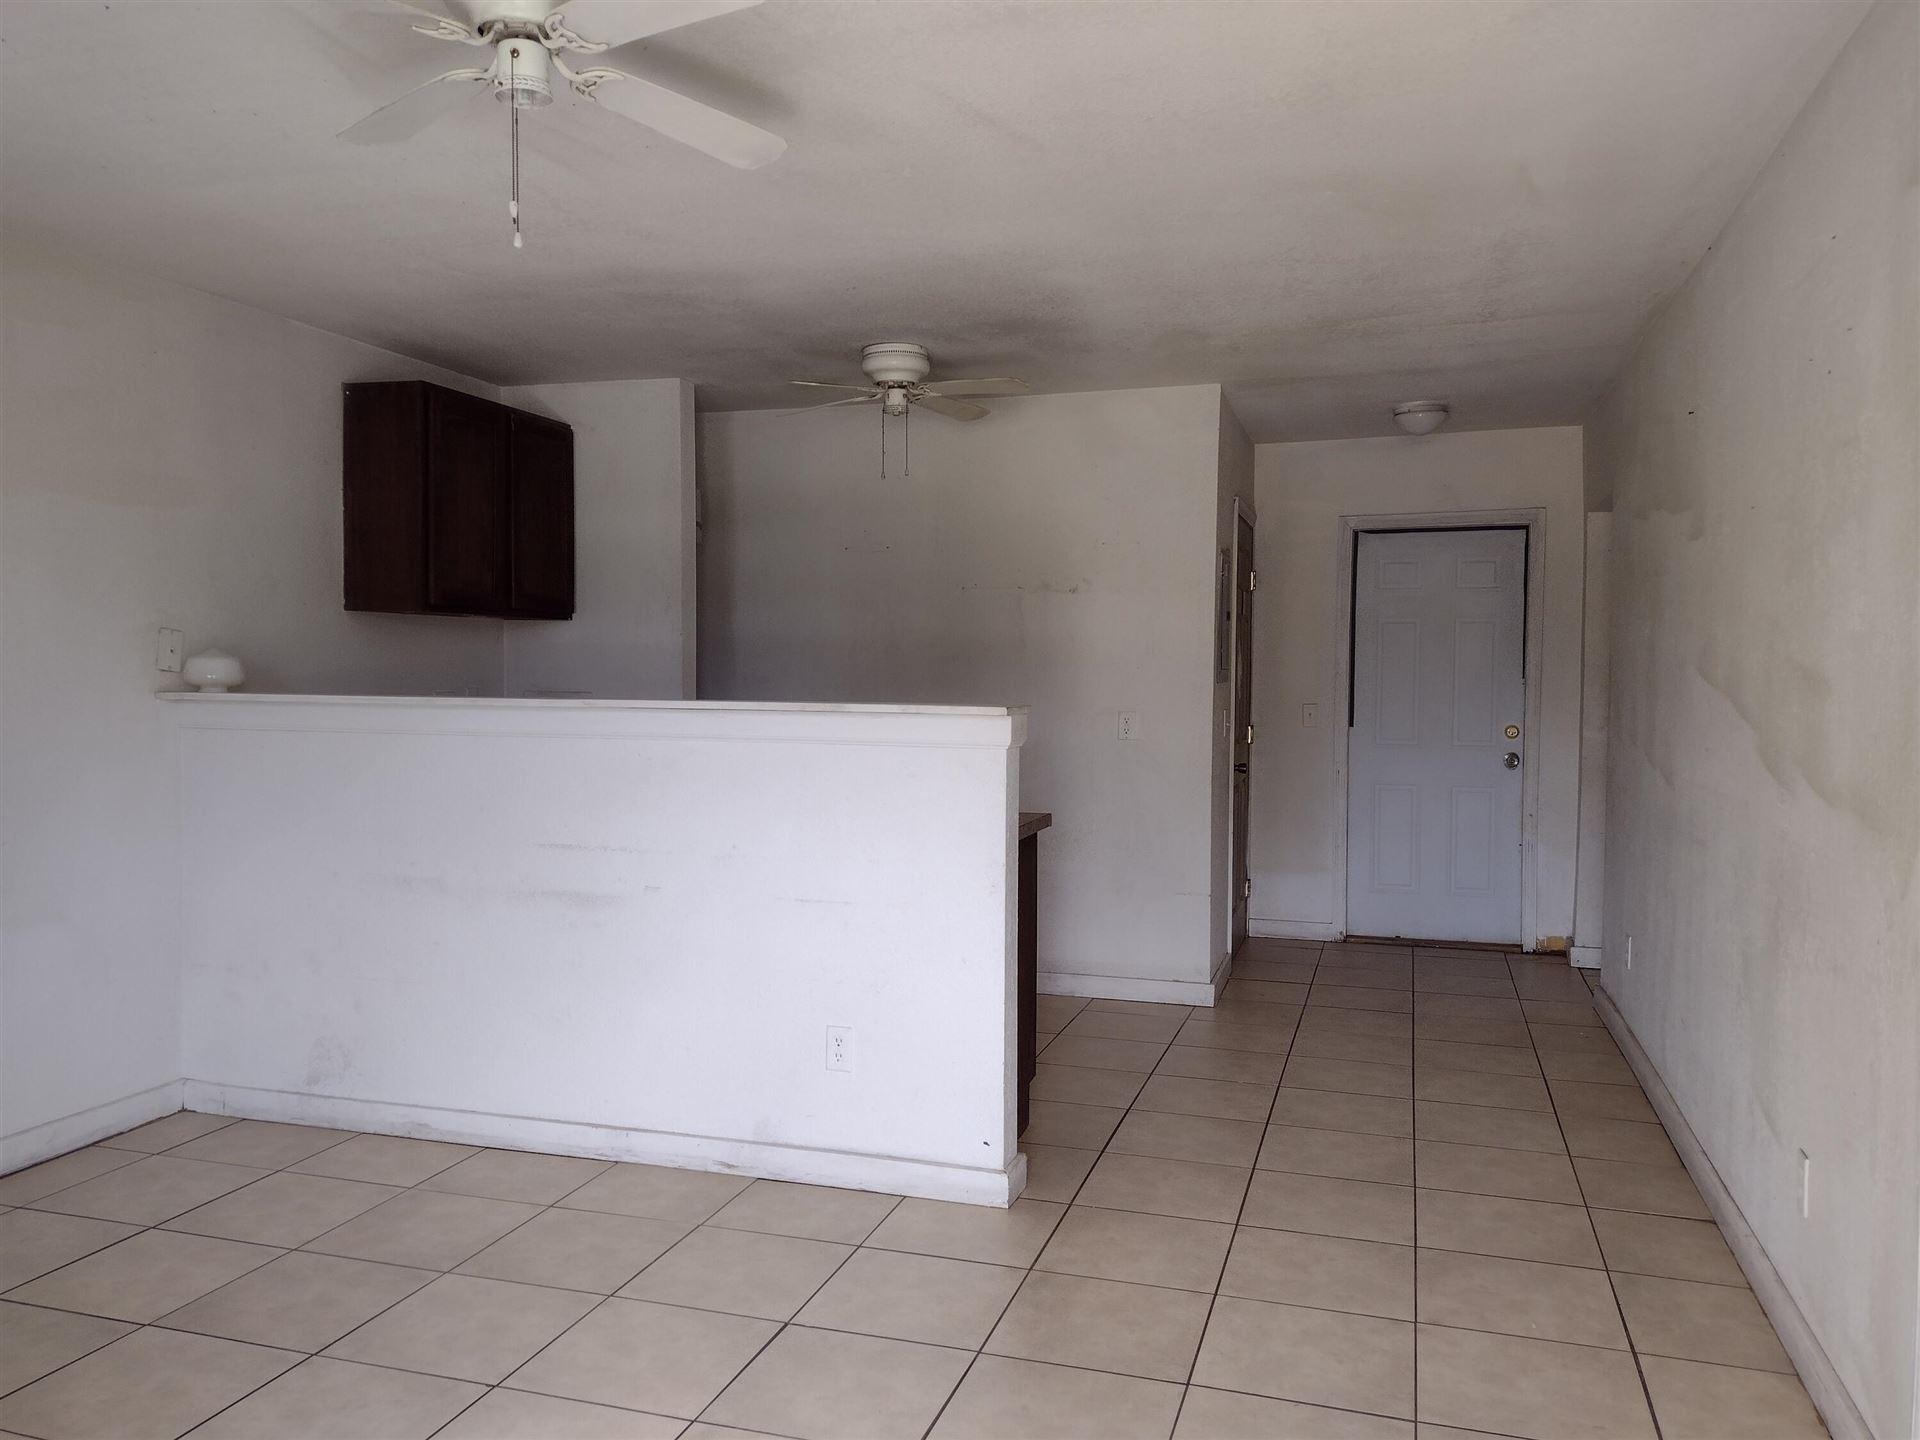 3976 46th Place, Vero Beach, FL 32967 - MLS#: RX-10729724